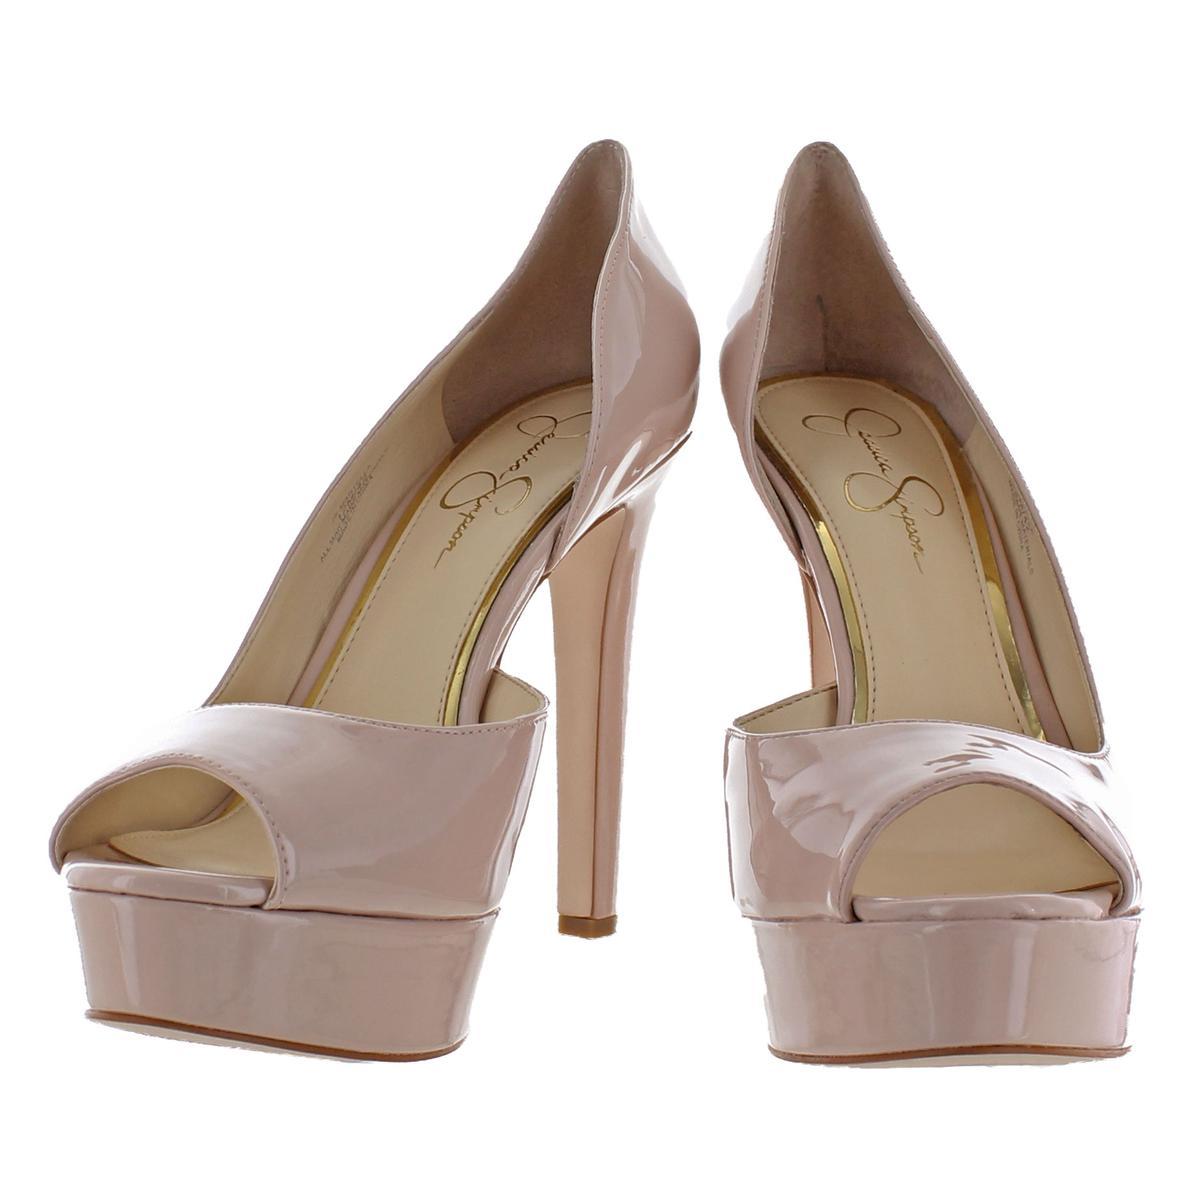 Jessica-Simpson-Martella-Women-039-s-Almond-Peep-Toe-Stiletto-d-039-Orsay-Heels-Shoes thumbnail 3